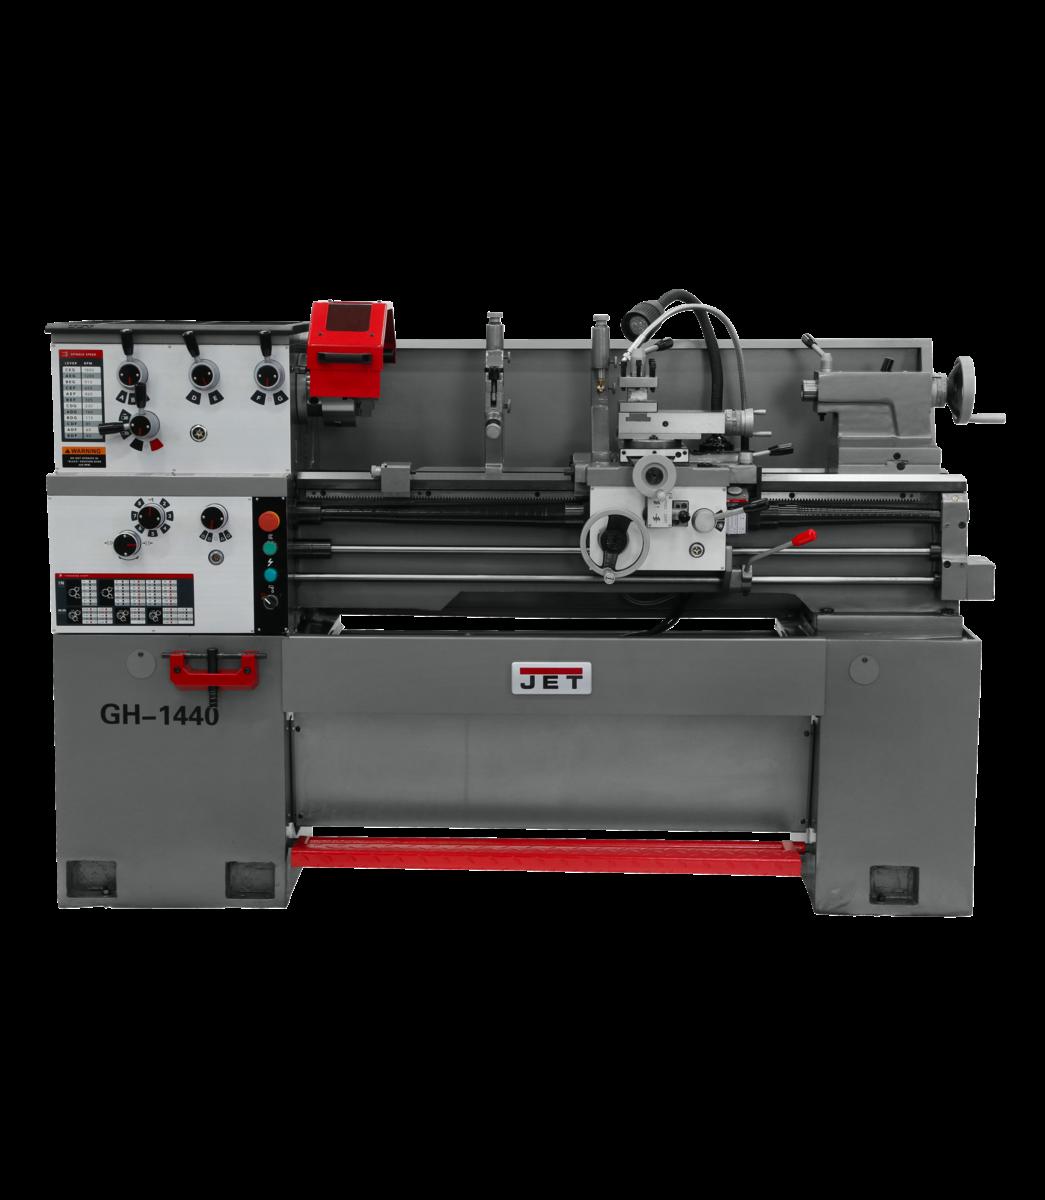 GH-1440-1 Lathe with Taper Attachment